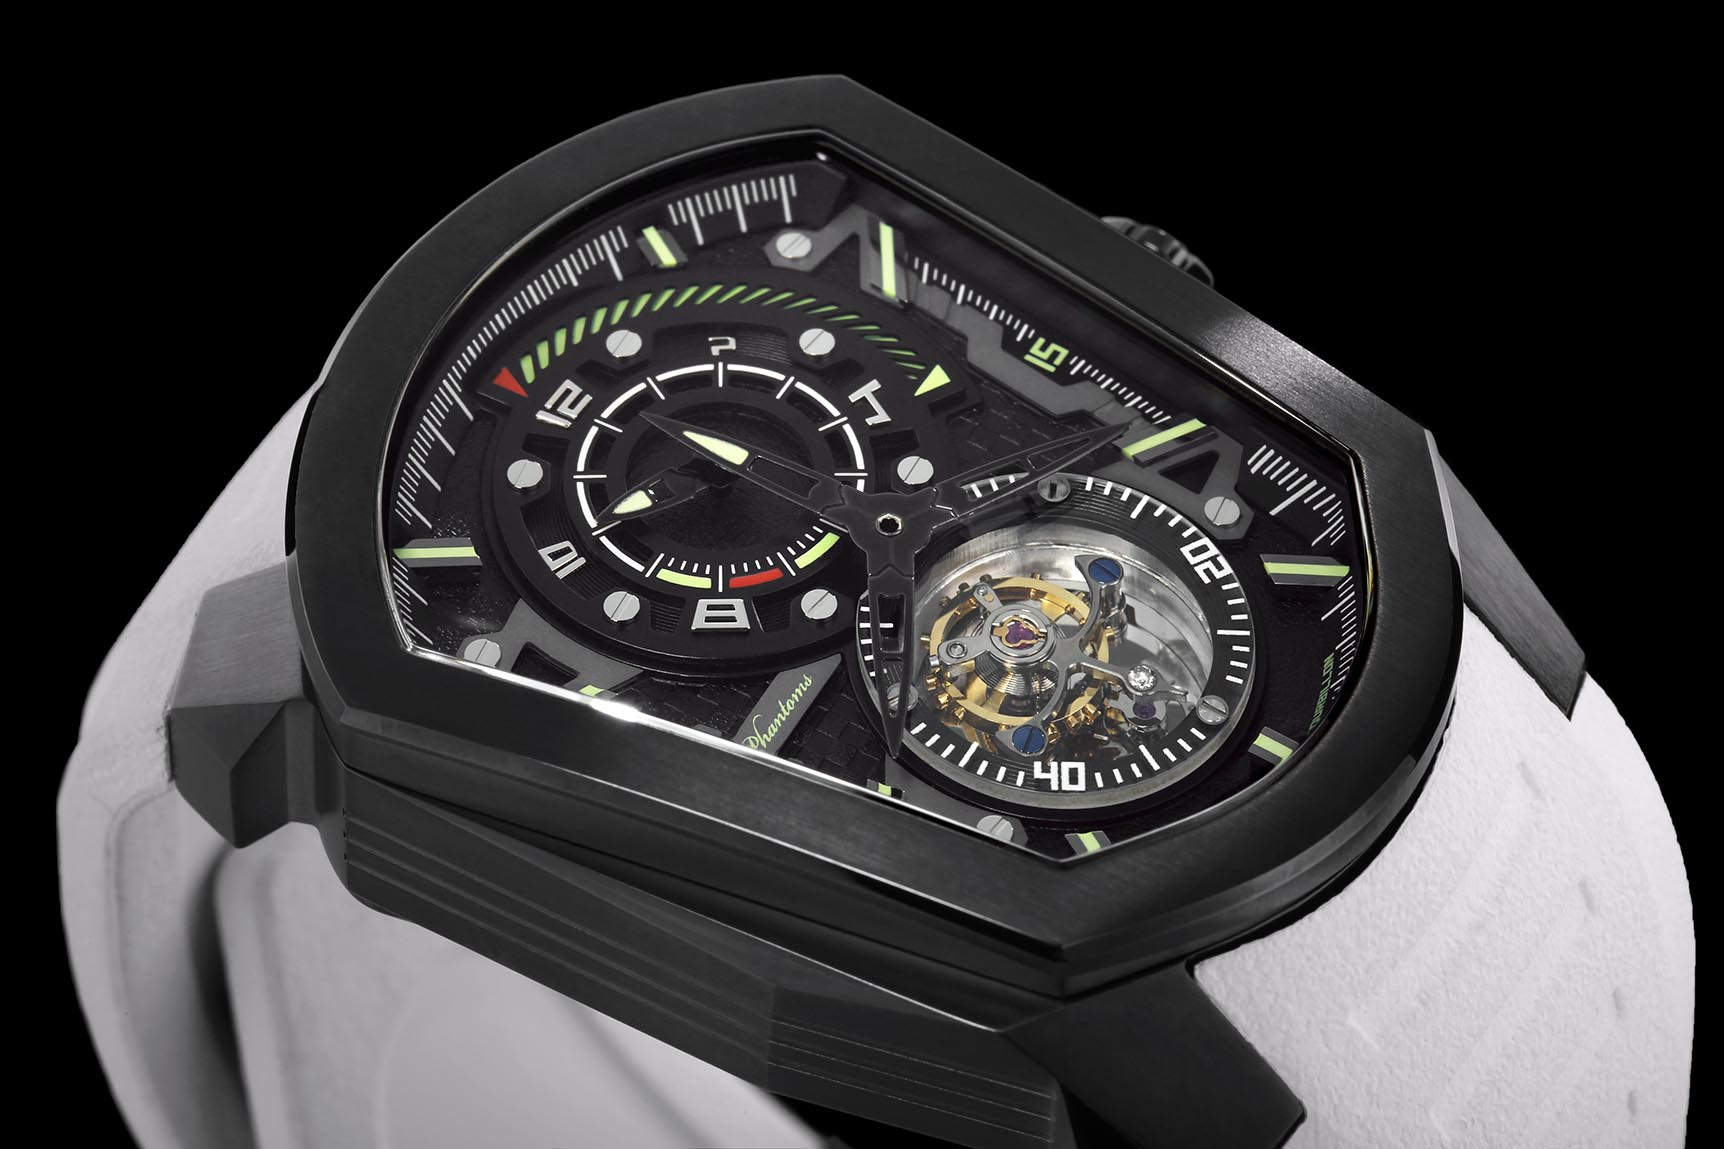 cosmic speedforce mechanical watch white automatic watch phantoms tourbillon white strap